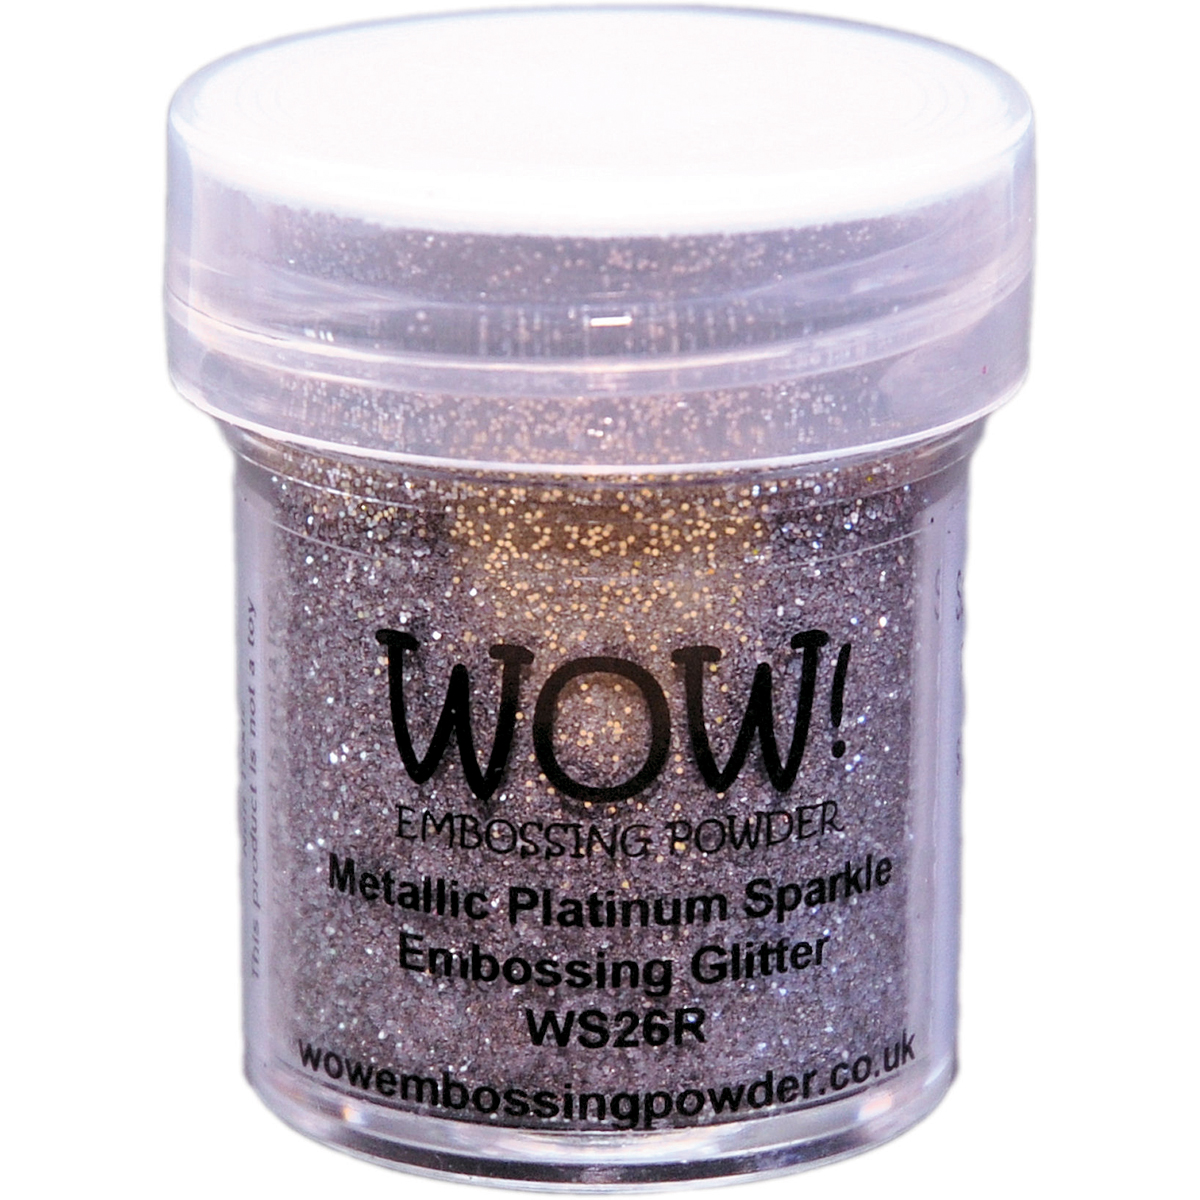 WOW Metallic Platinum Sparkle